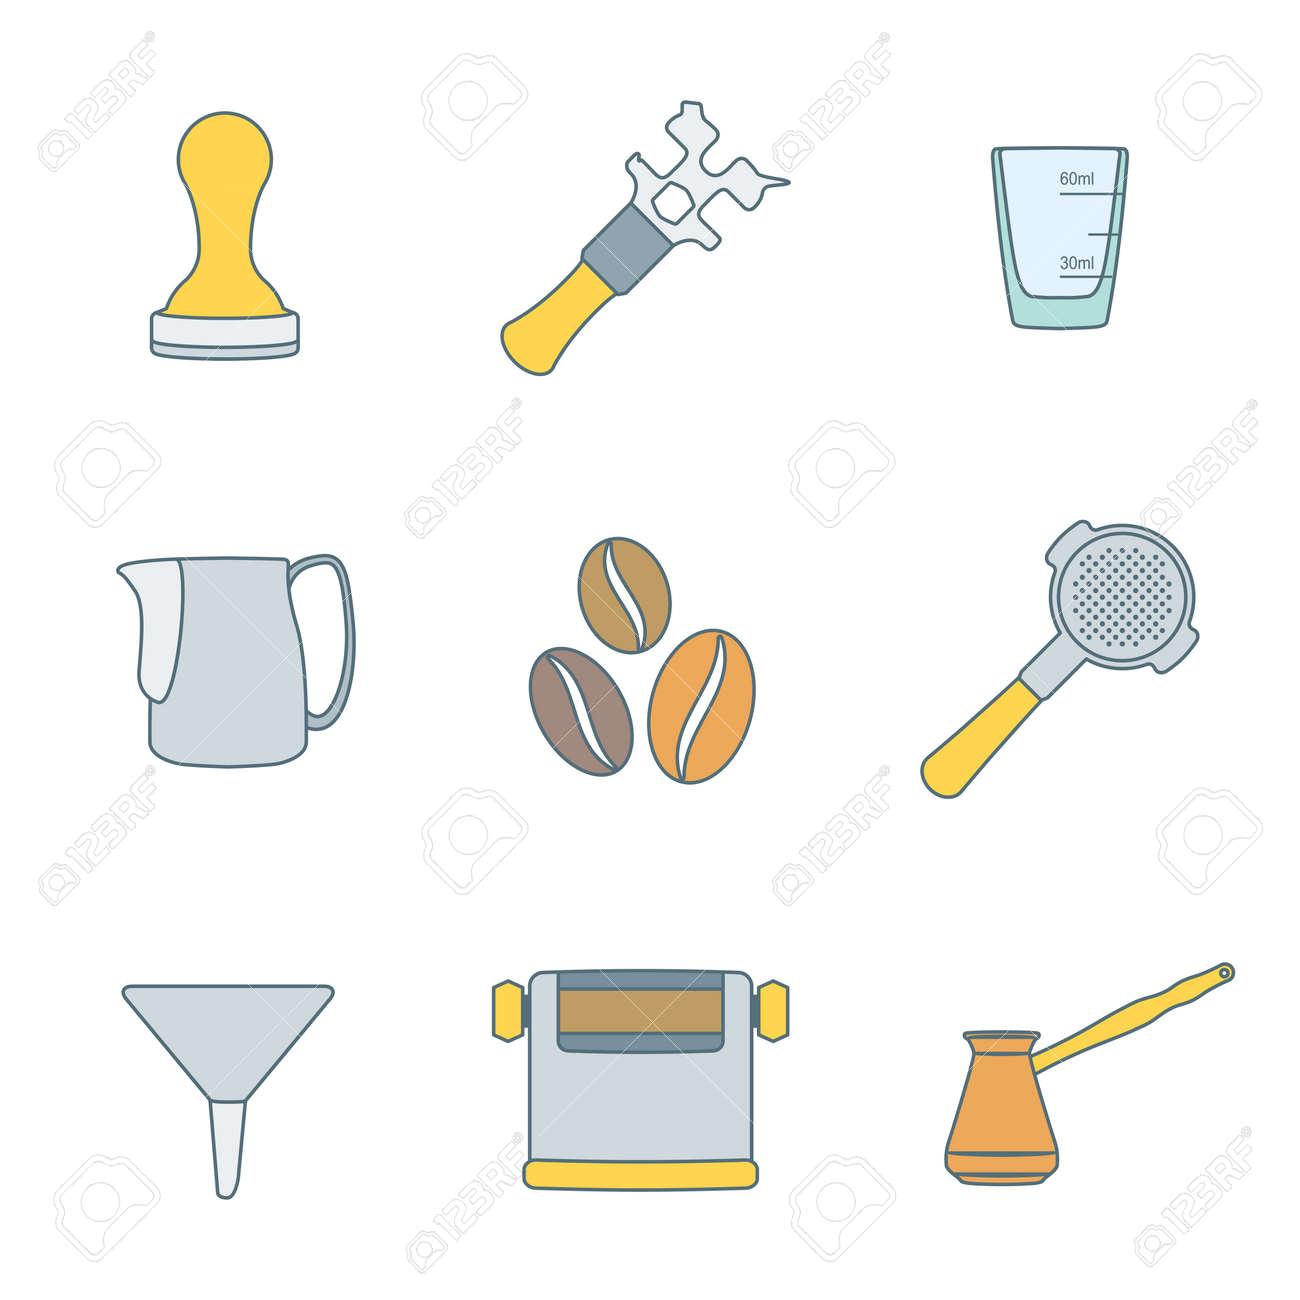 http://previews.123rf.com/images/al4k/al4k1412/al4k141200073/34919183-vector-colored-outline-coffee-barista-equipment-icons-set-tools-espresso-tamper-coffee-wrench-measur-Stock-Vector.jpg